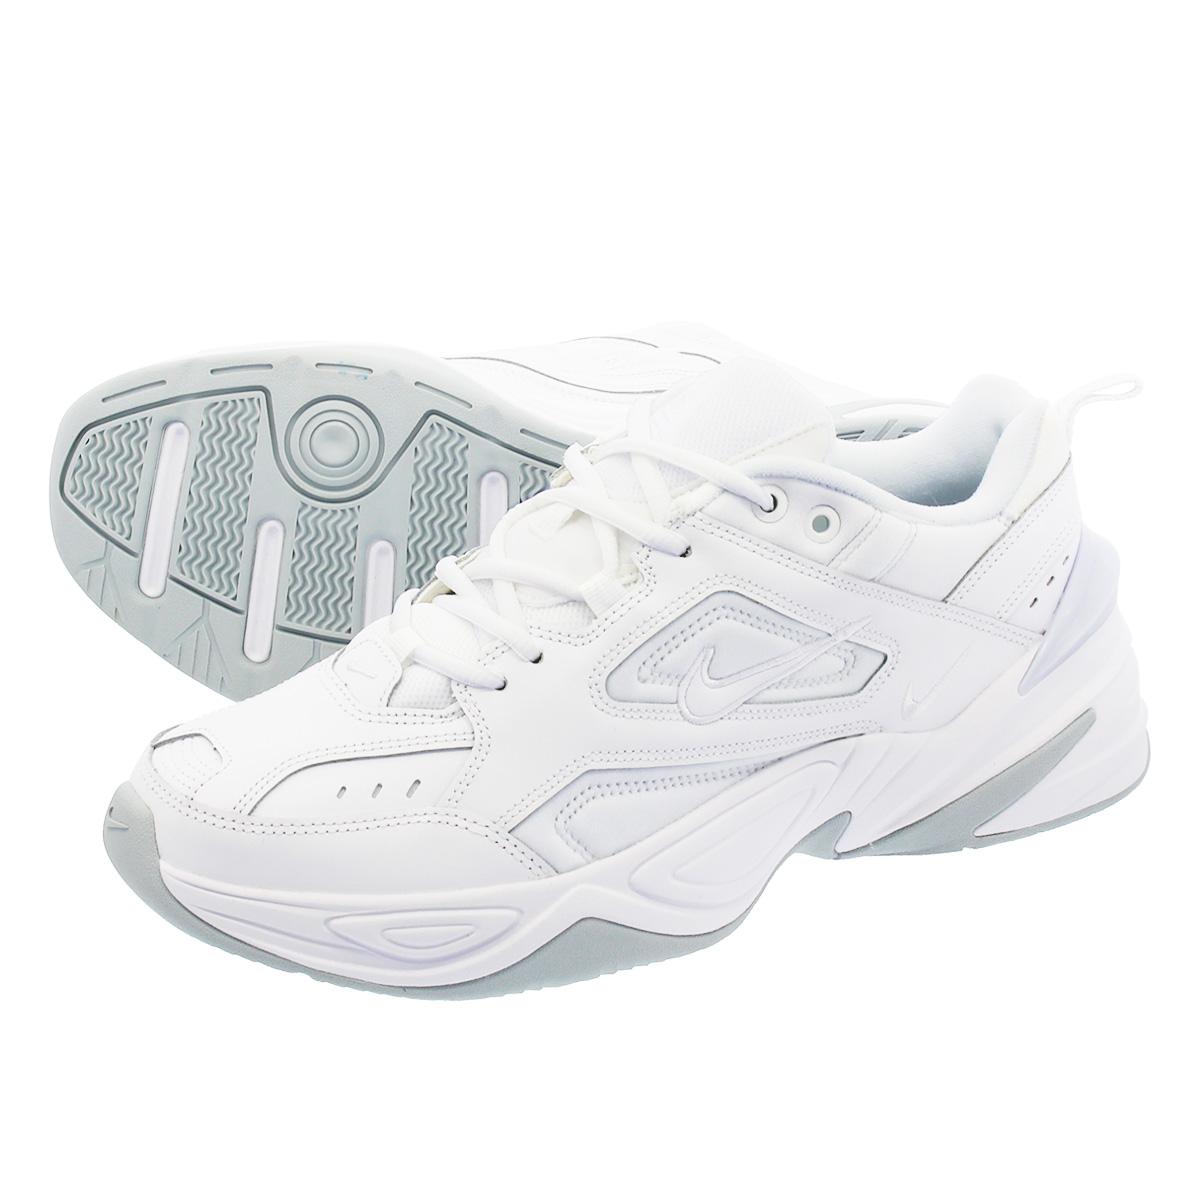 LOWTEX PLUS  NIKE M2K TEKNO Nike M2K techno WHITE WHITE PURE PLATINUM av4789 -101  31694af56a65a